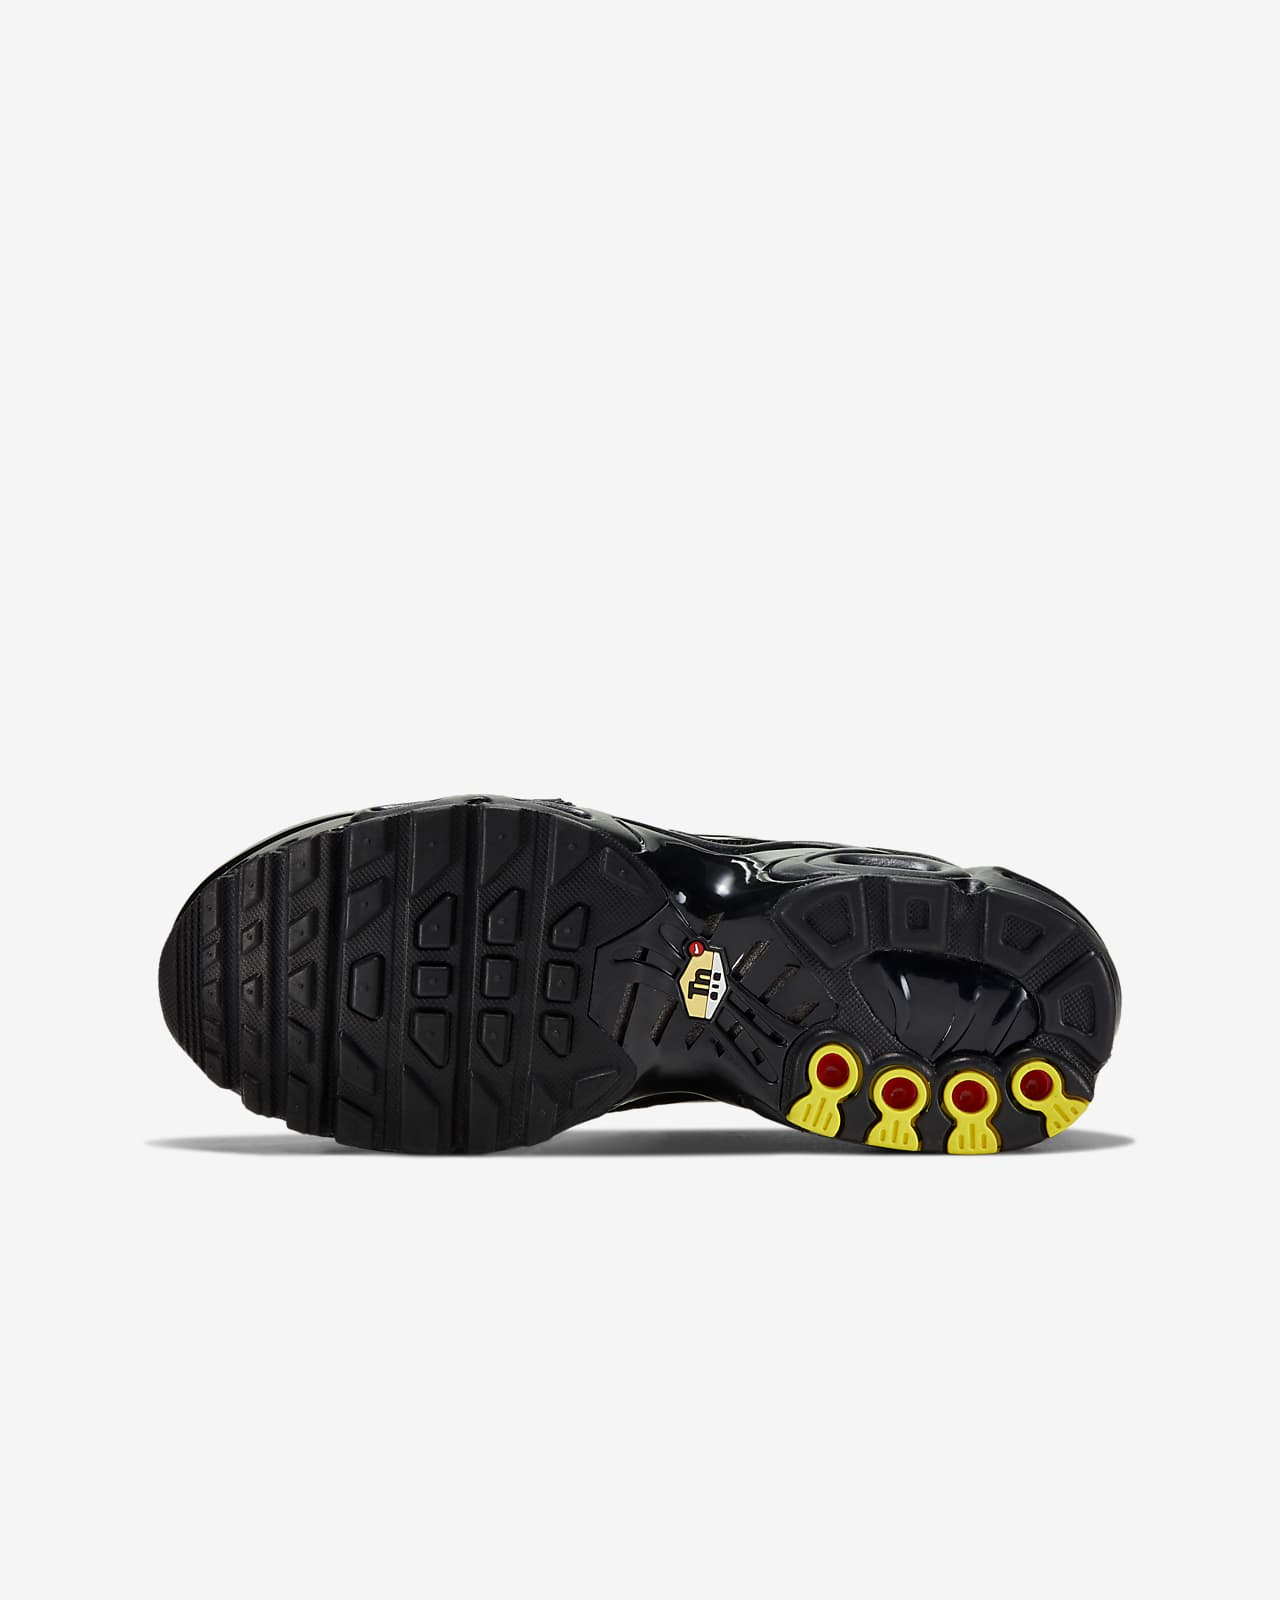 chaussure nike air max plus enfant